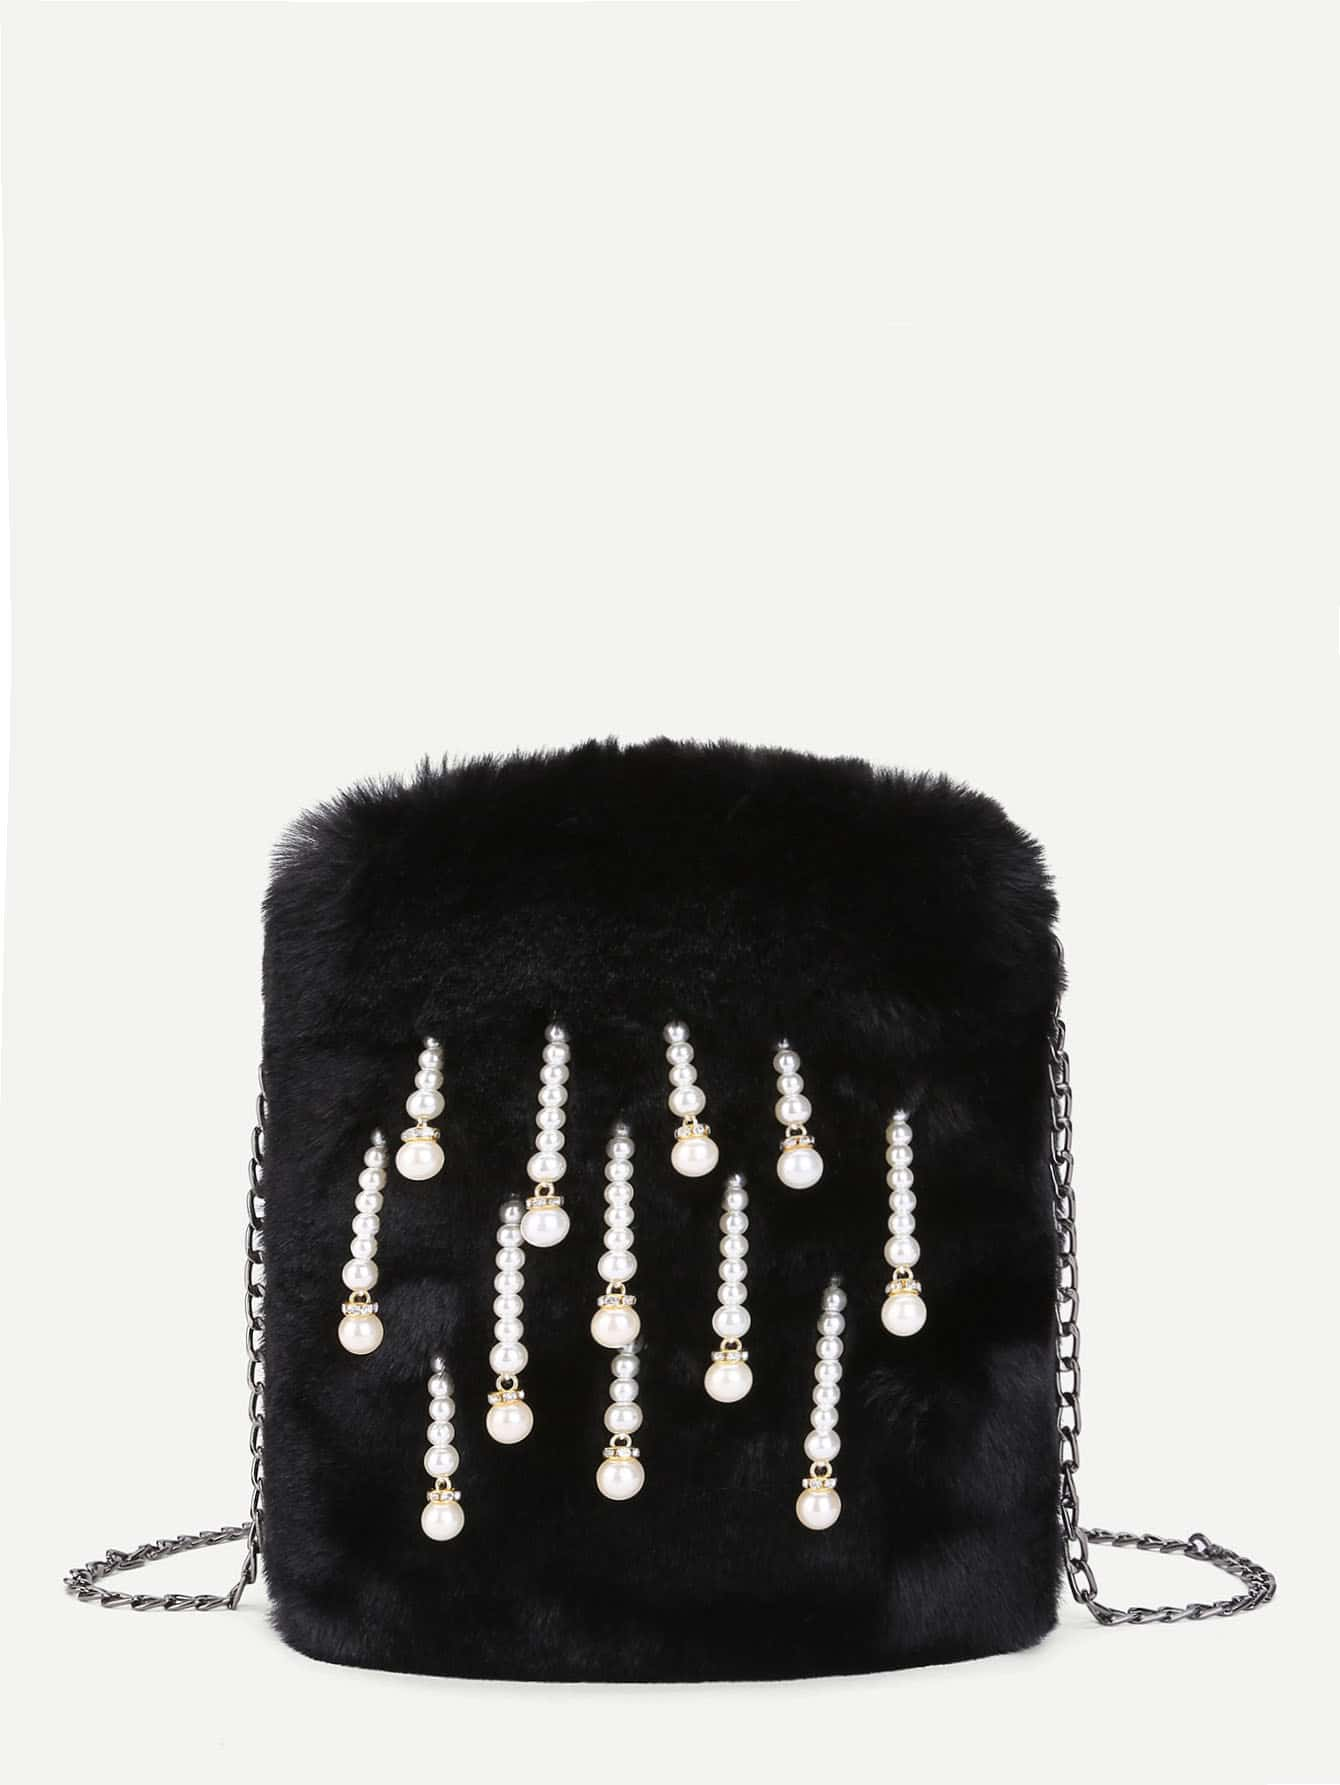 Faux Pearl Decorated Faux Fur Chain Bag